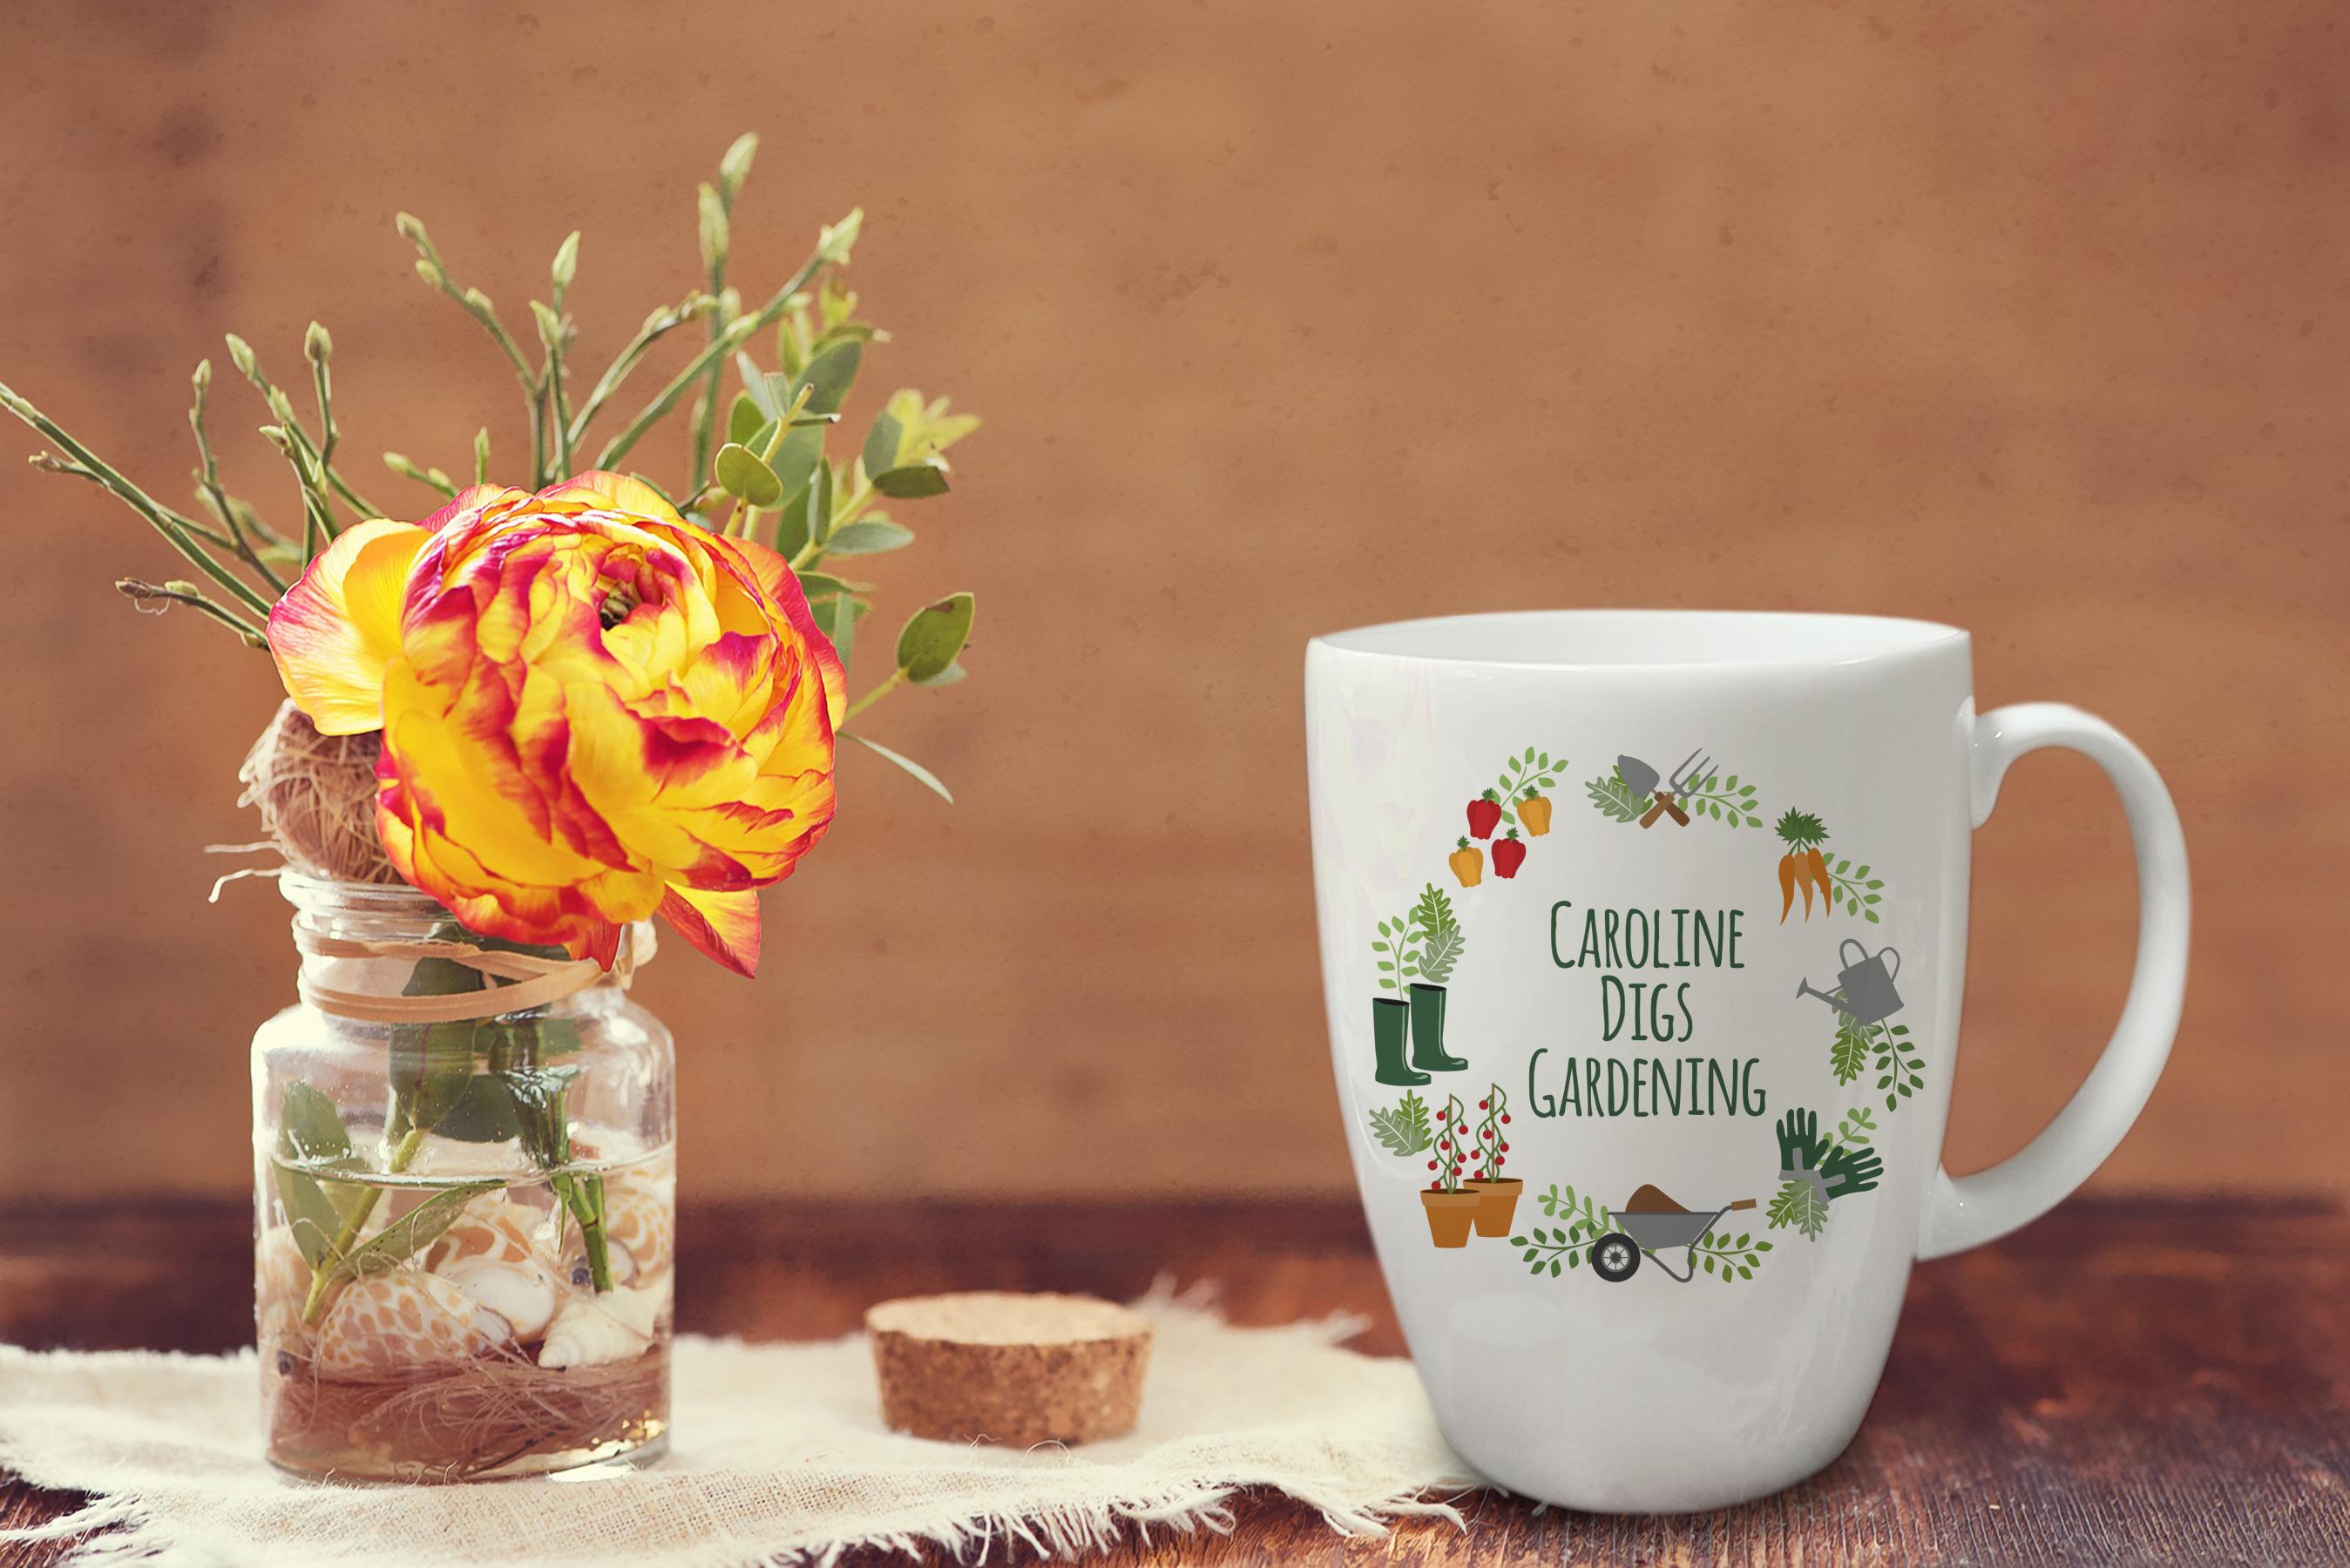 Digs Gardening Conical Mug